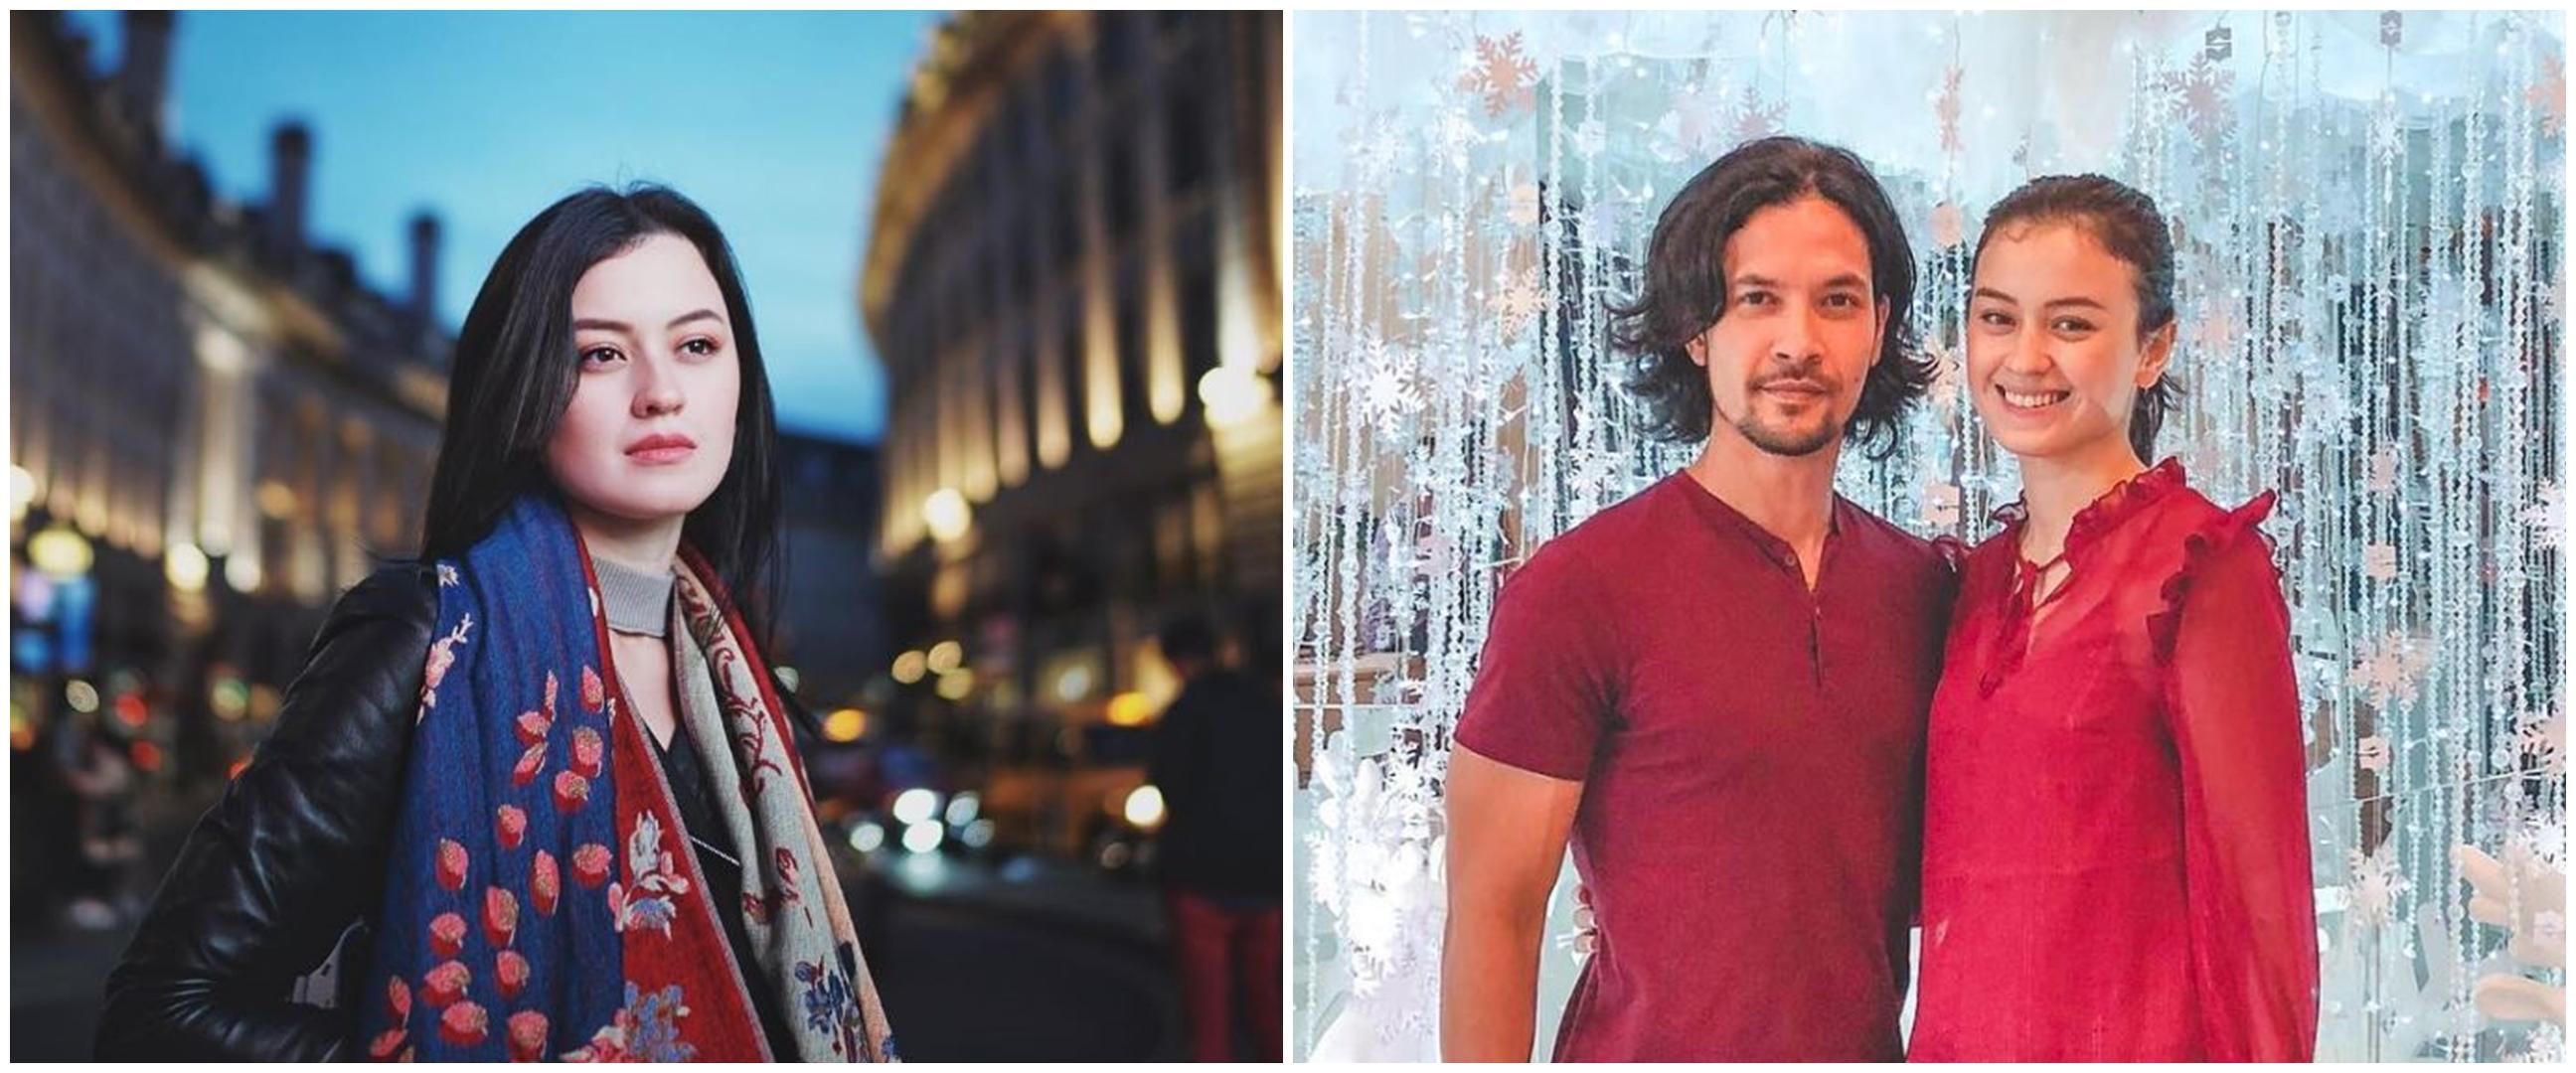 Hamil anak kedua, ini 10 potret romantis Kimberly Ryder dan suami